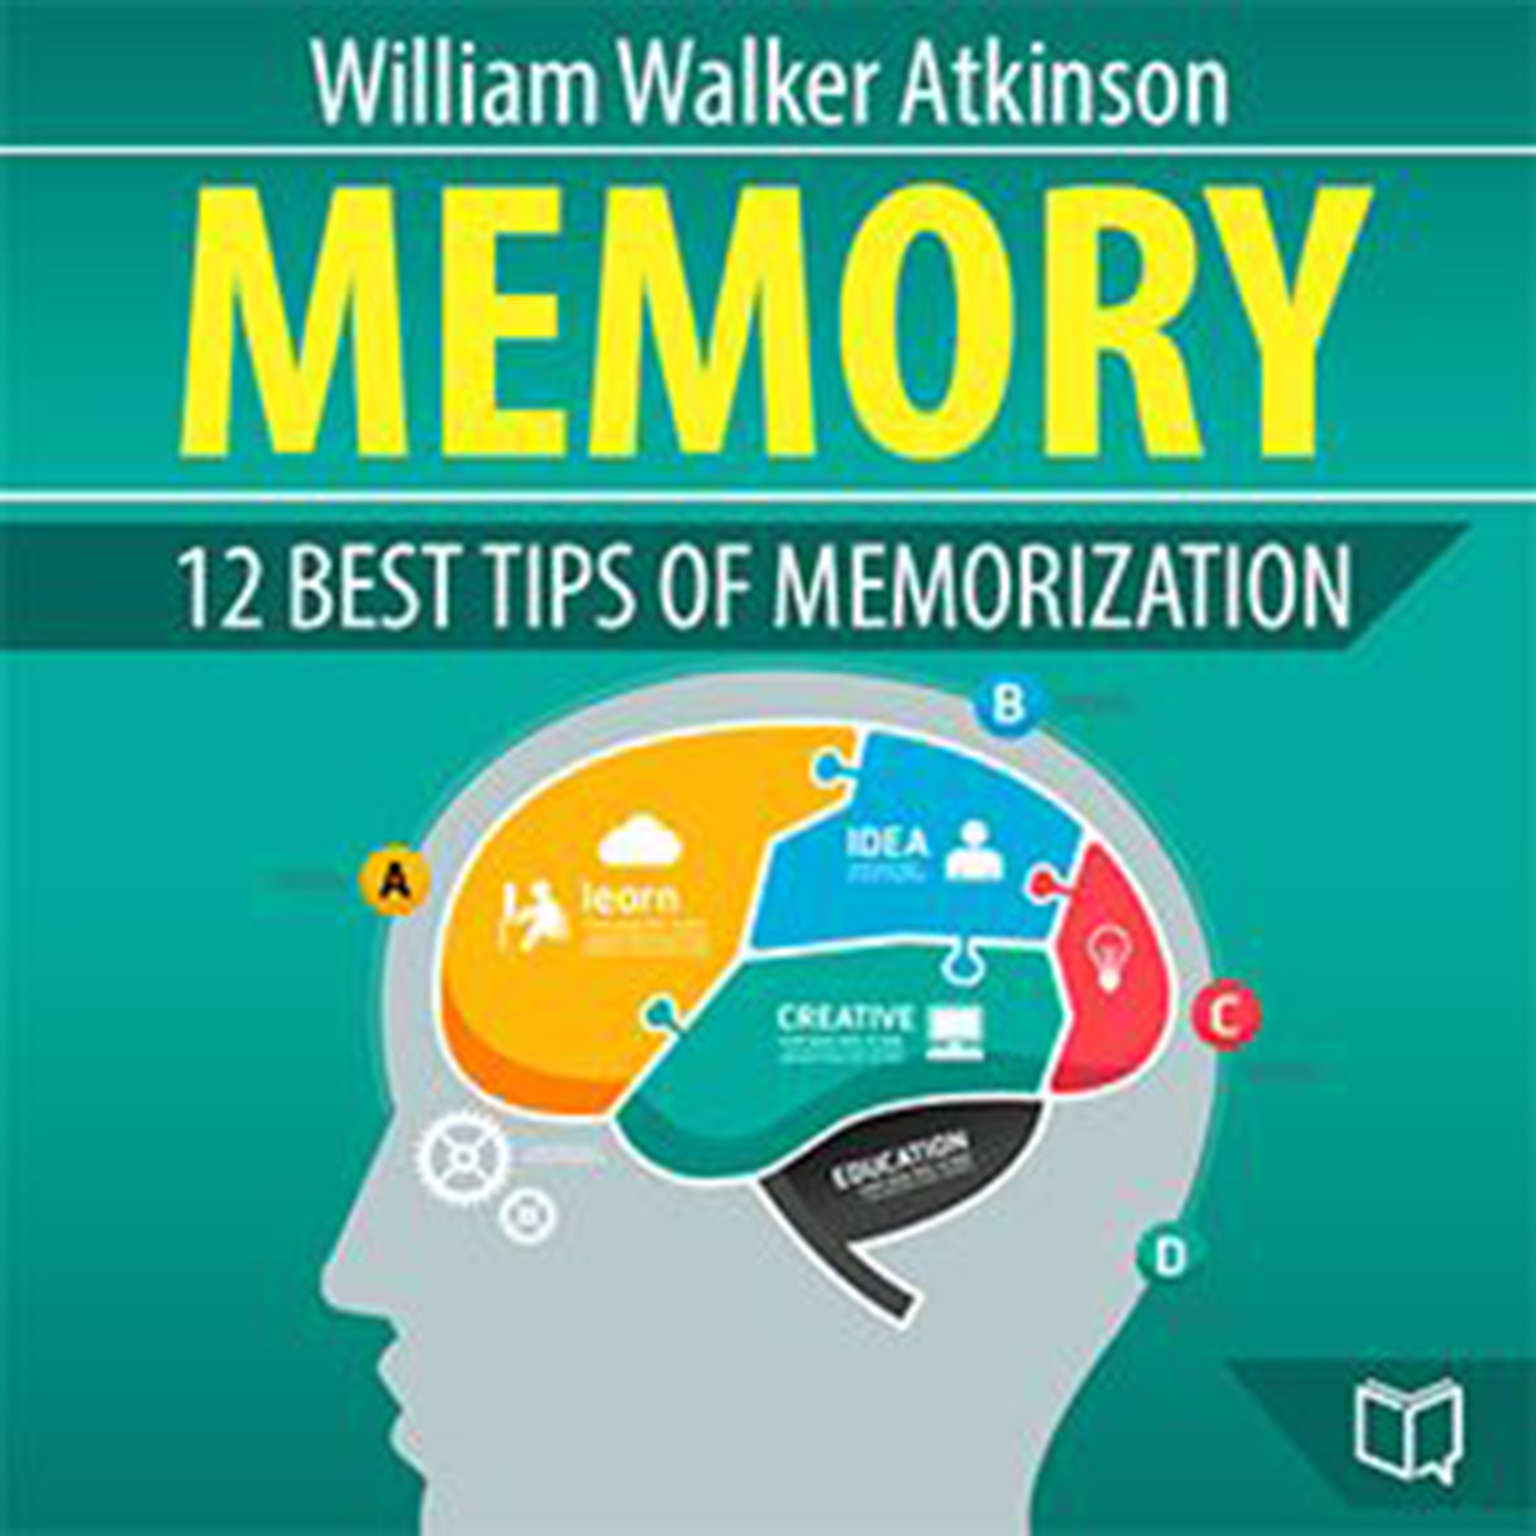 Memory: 12 Best Tips of Memorization: 12 Best Tips of Memorization Audiobook, by William Walker Atkinson